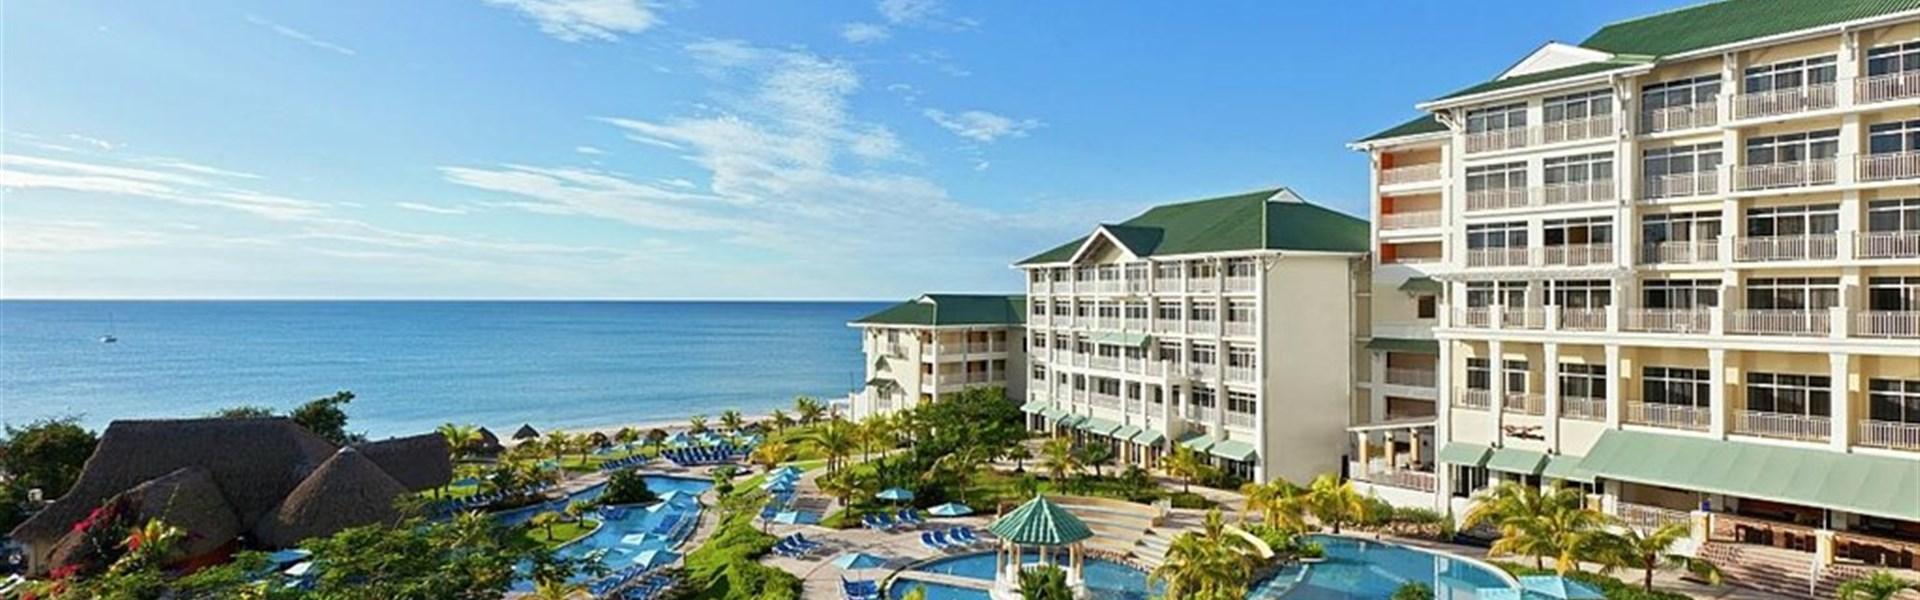 Bijao Beach Resort 4* - All Inclusive -